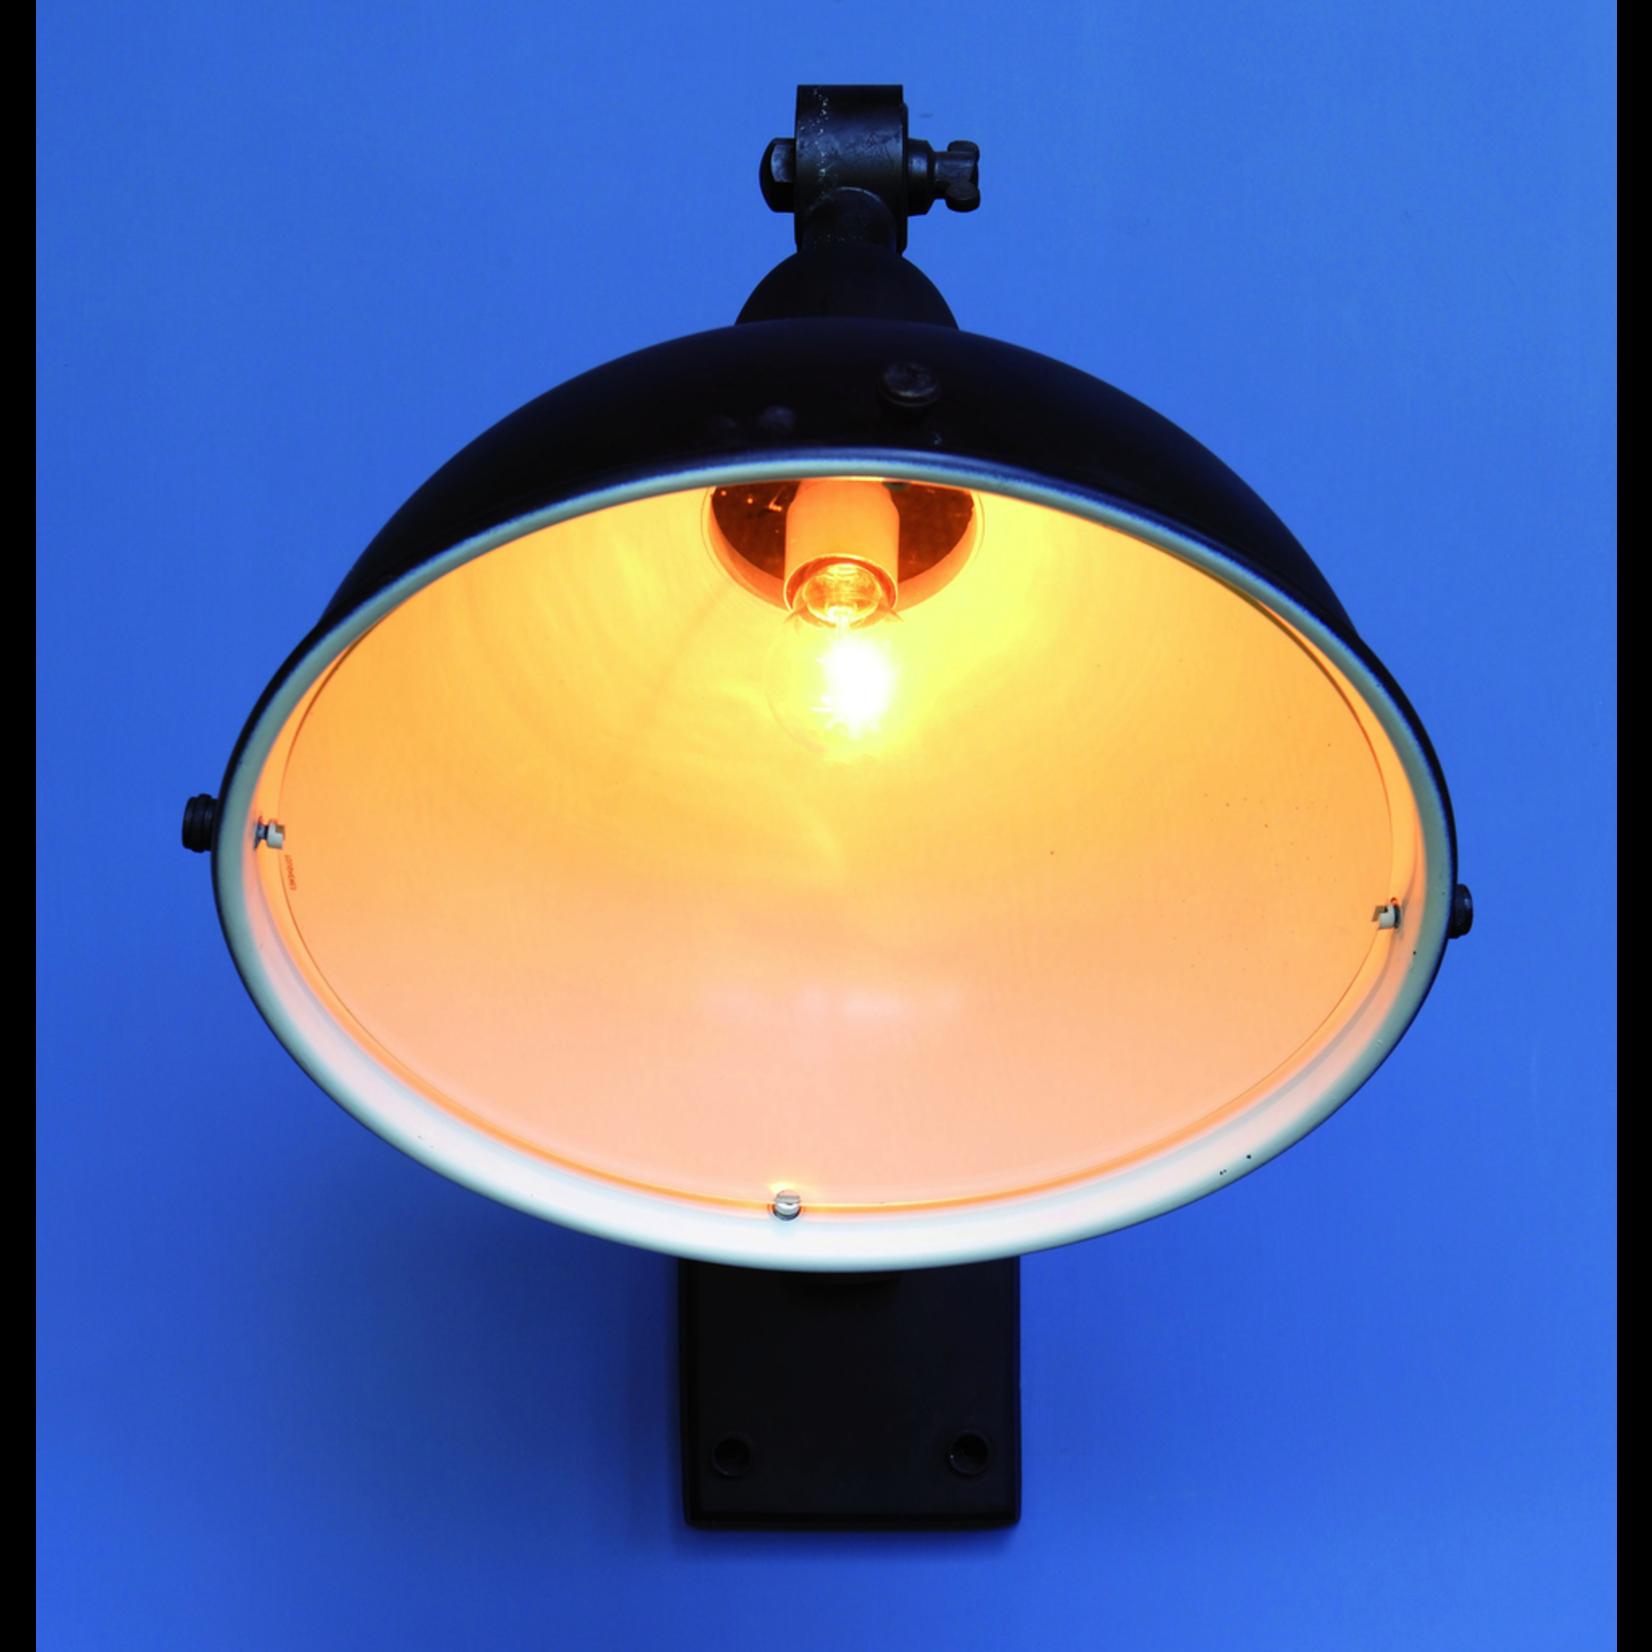 CHEHOMA WALL LAMP ANTIQUE BLACK FINISH